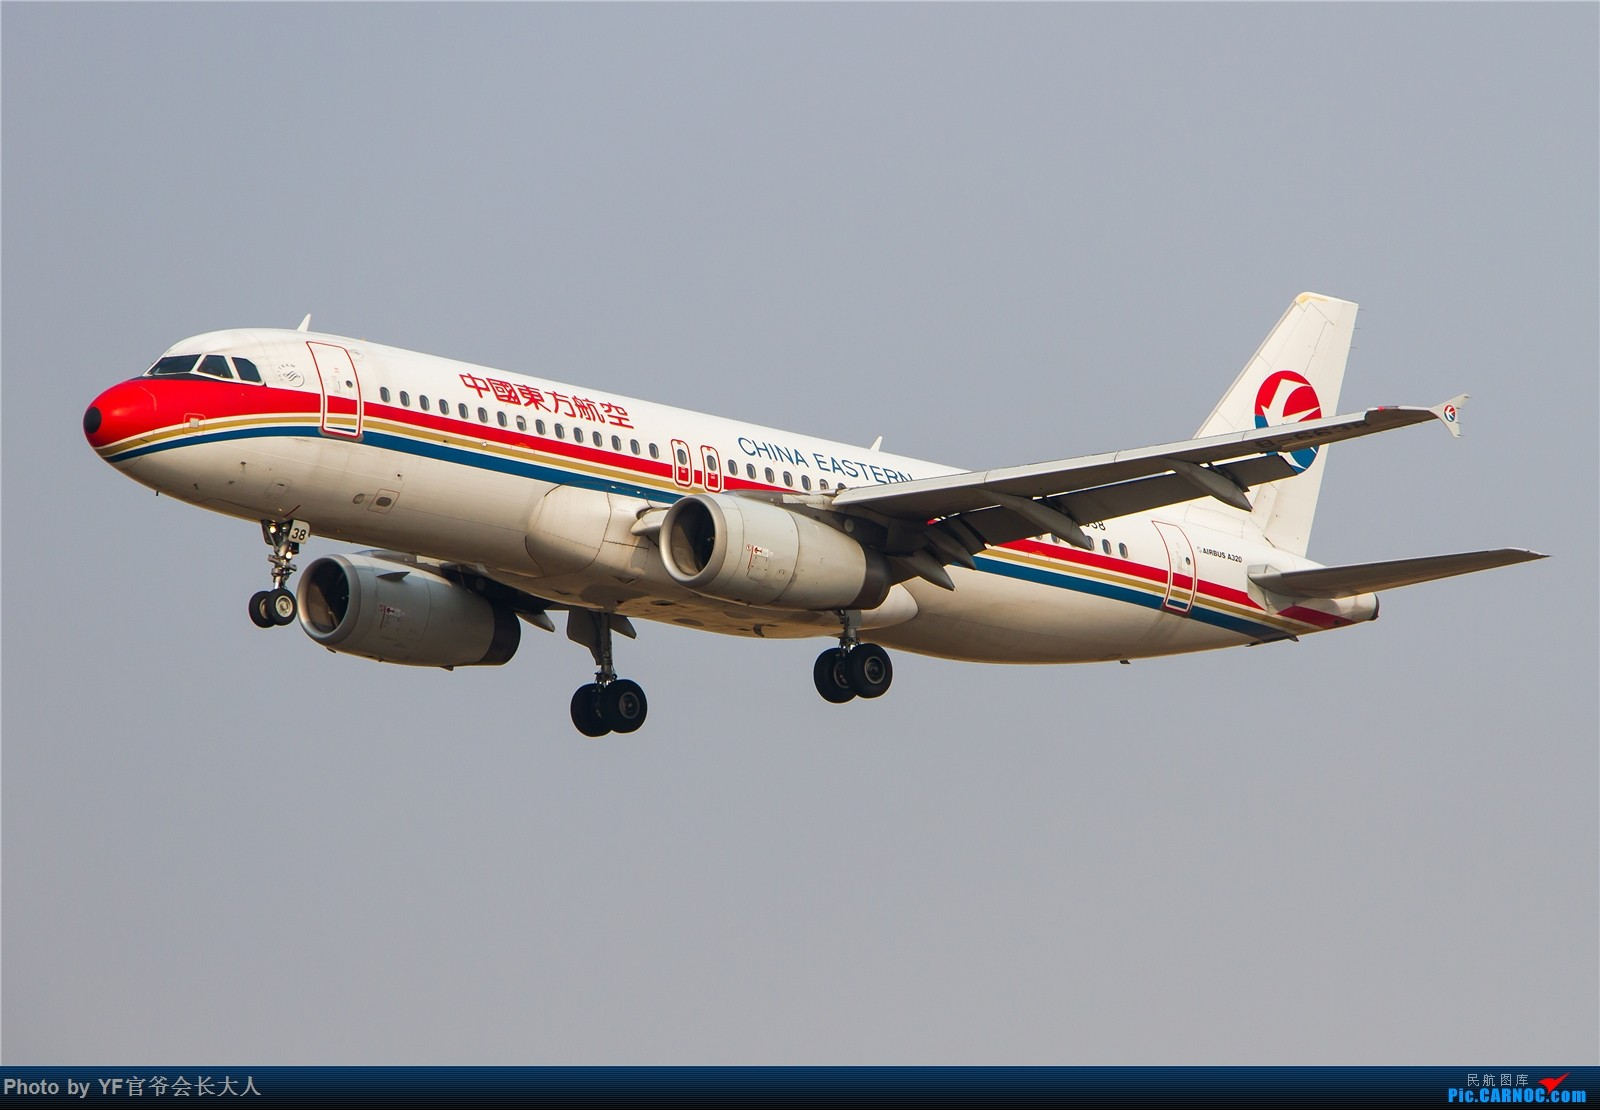 Re:[原创]【ZYTX】【1600*1066】论坛首发:俄罗斯艾菲航空公司波音757-28A,注册号:EI-EWT,还有757斯基以及最近新拍机点拍的一些好货 AIRBUS A320-200 B-6638 中国沈阳桃仙国际机场